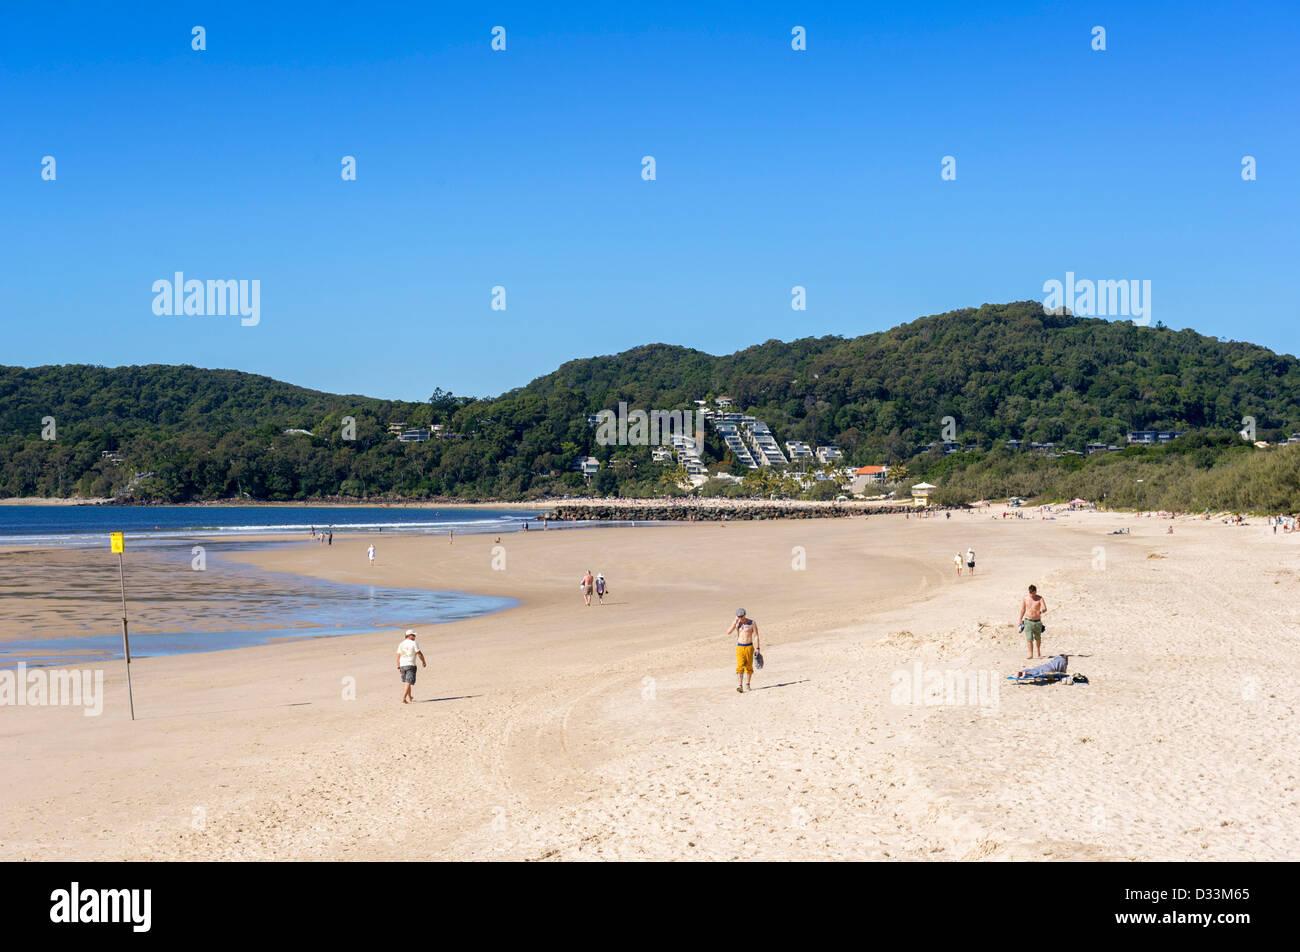 Noosa Beach on the Sunshine Coast in Queensland, Australia - Stock Image